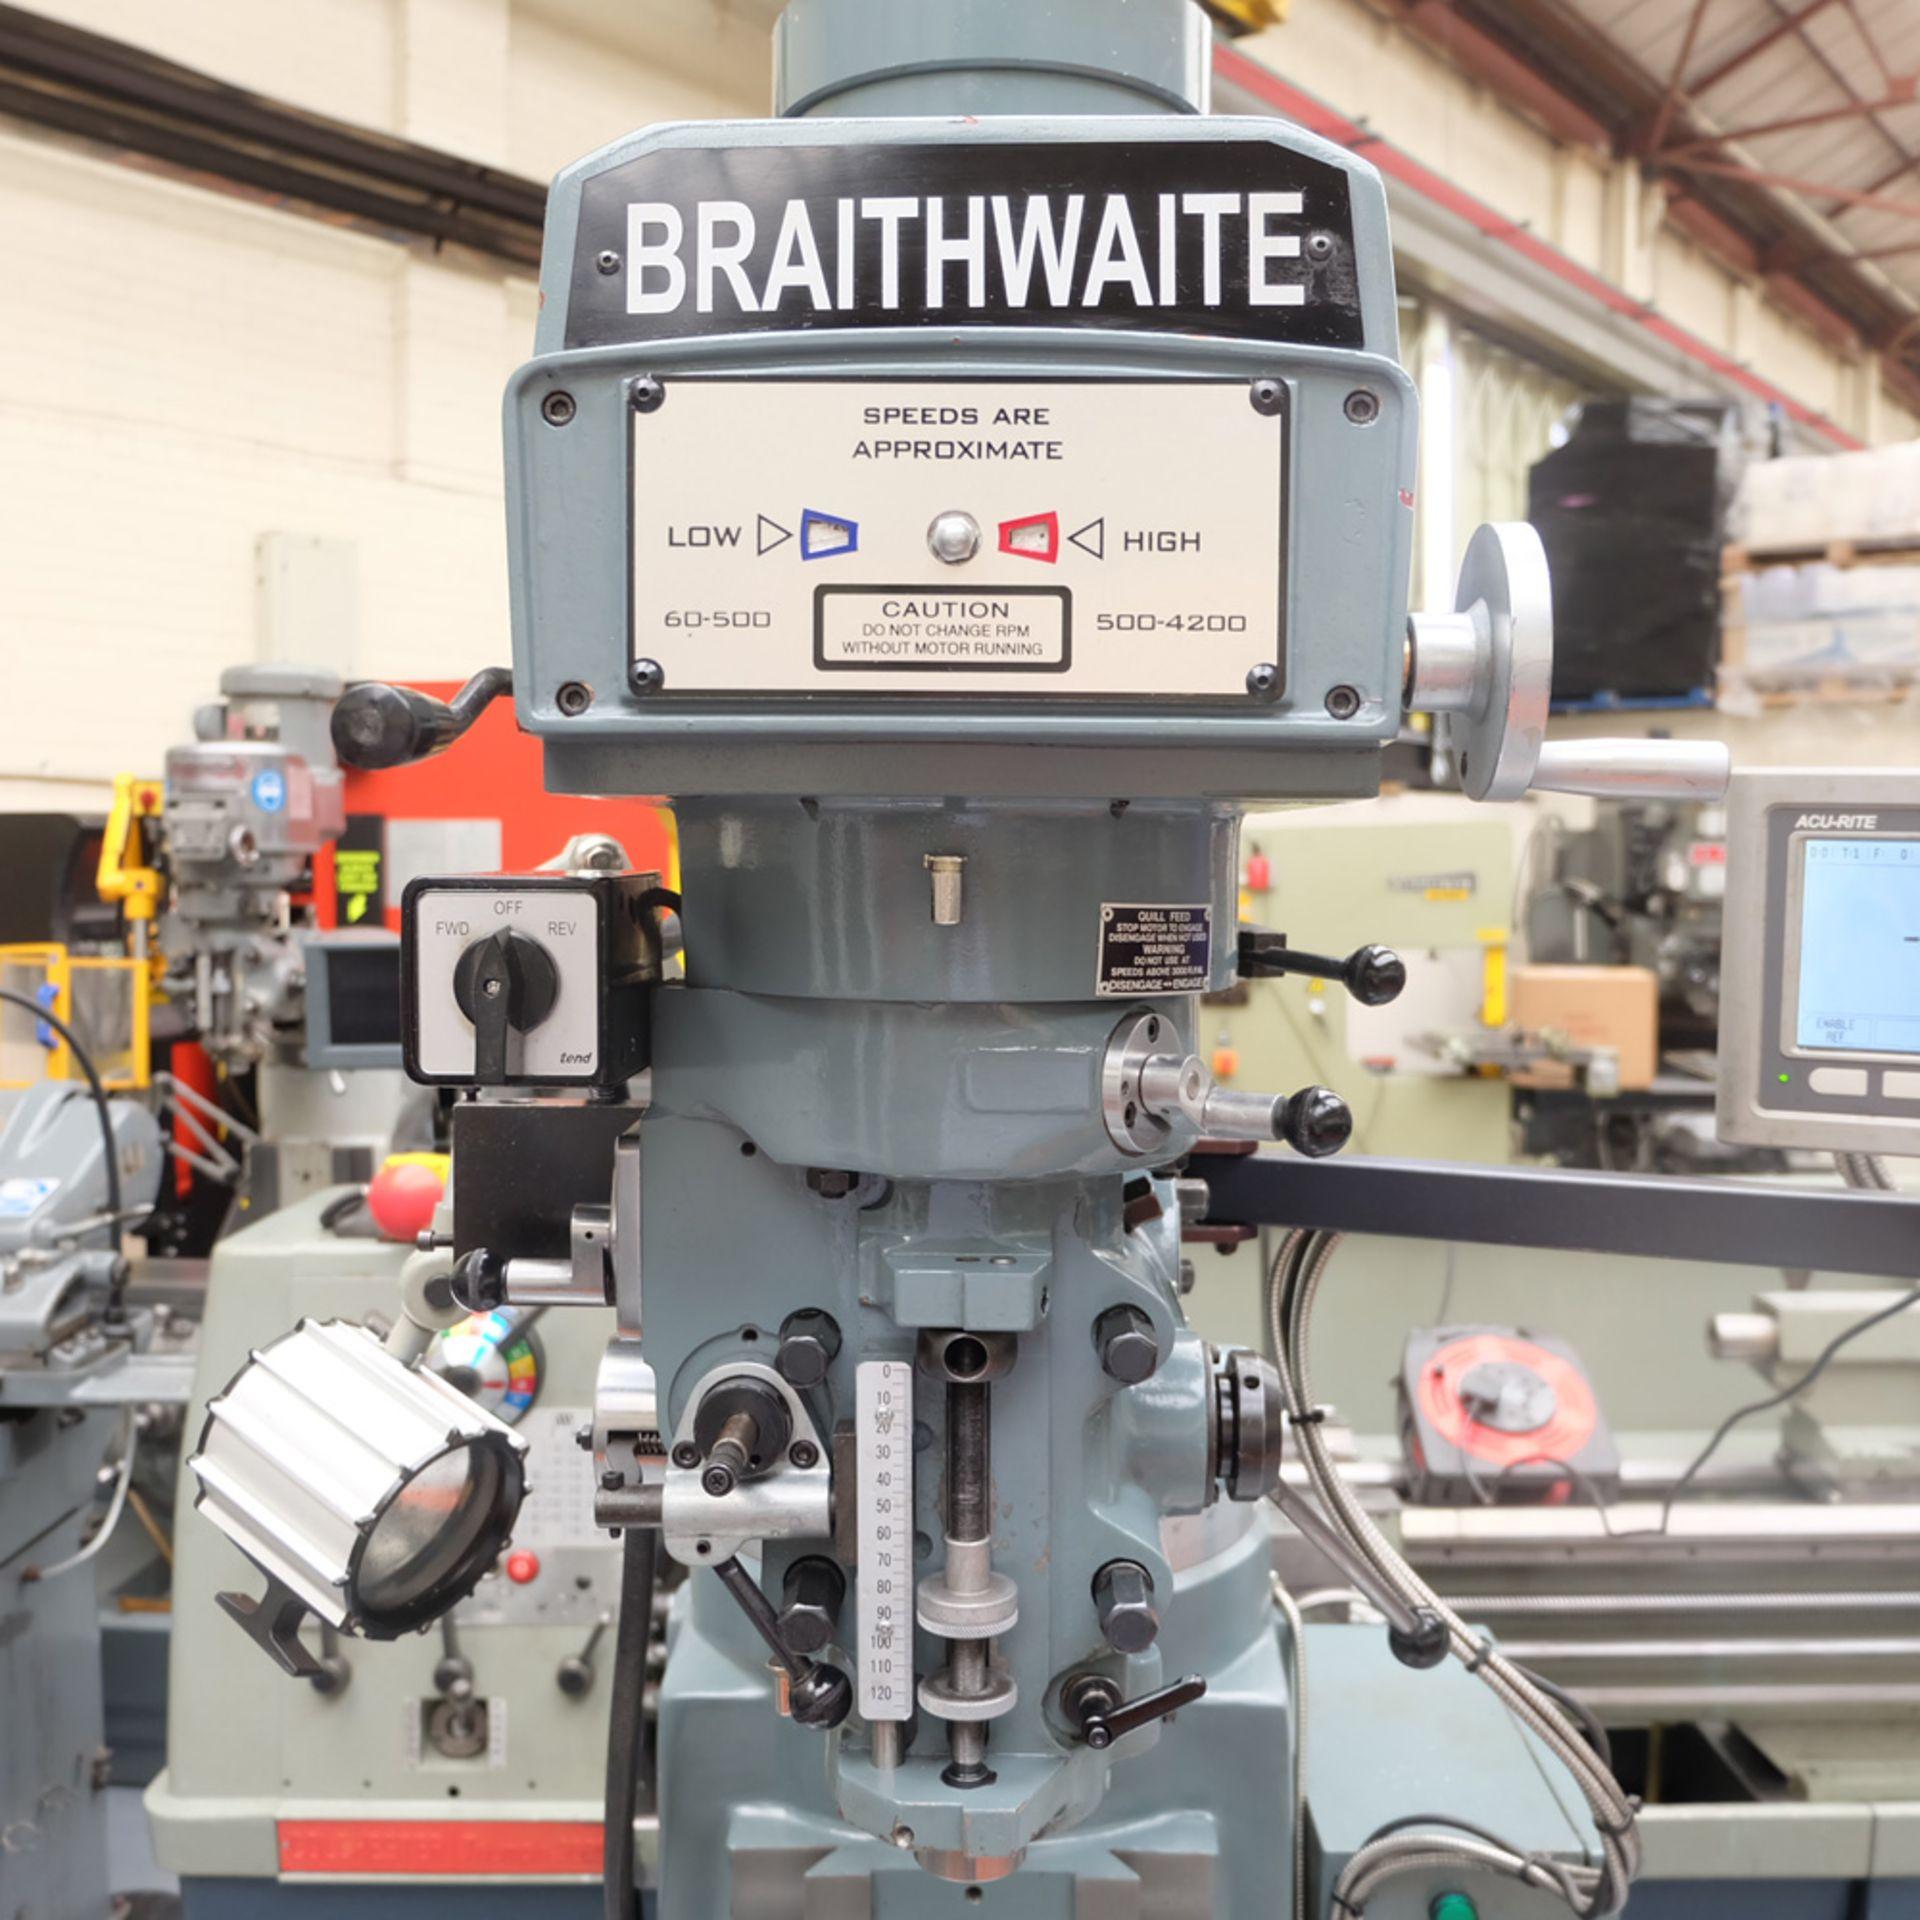 Braithwaite Model 6323B 3HP Vari Speed Turret Mill. - Image 4 of 20